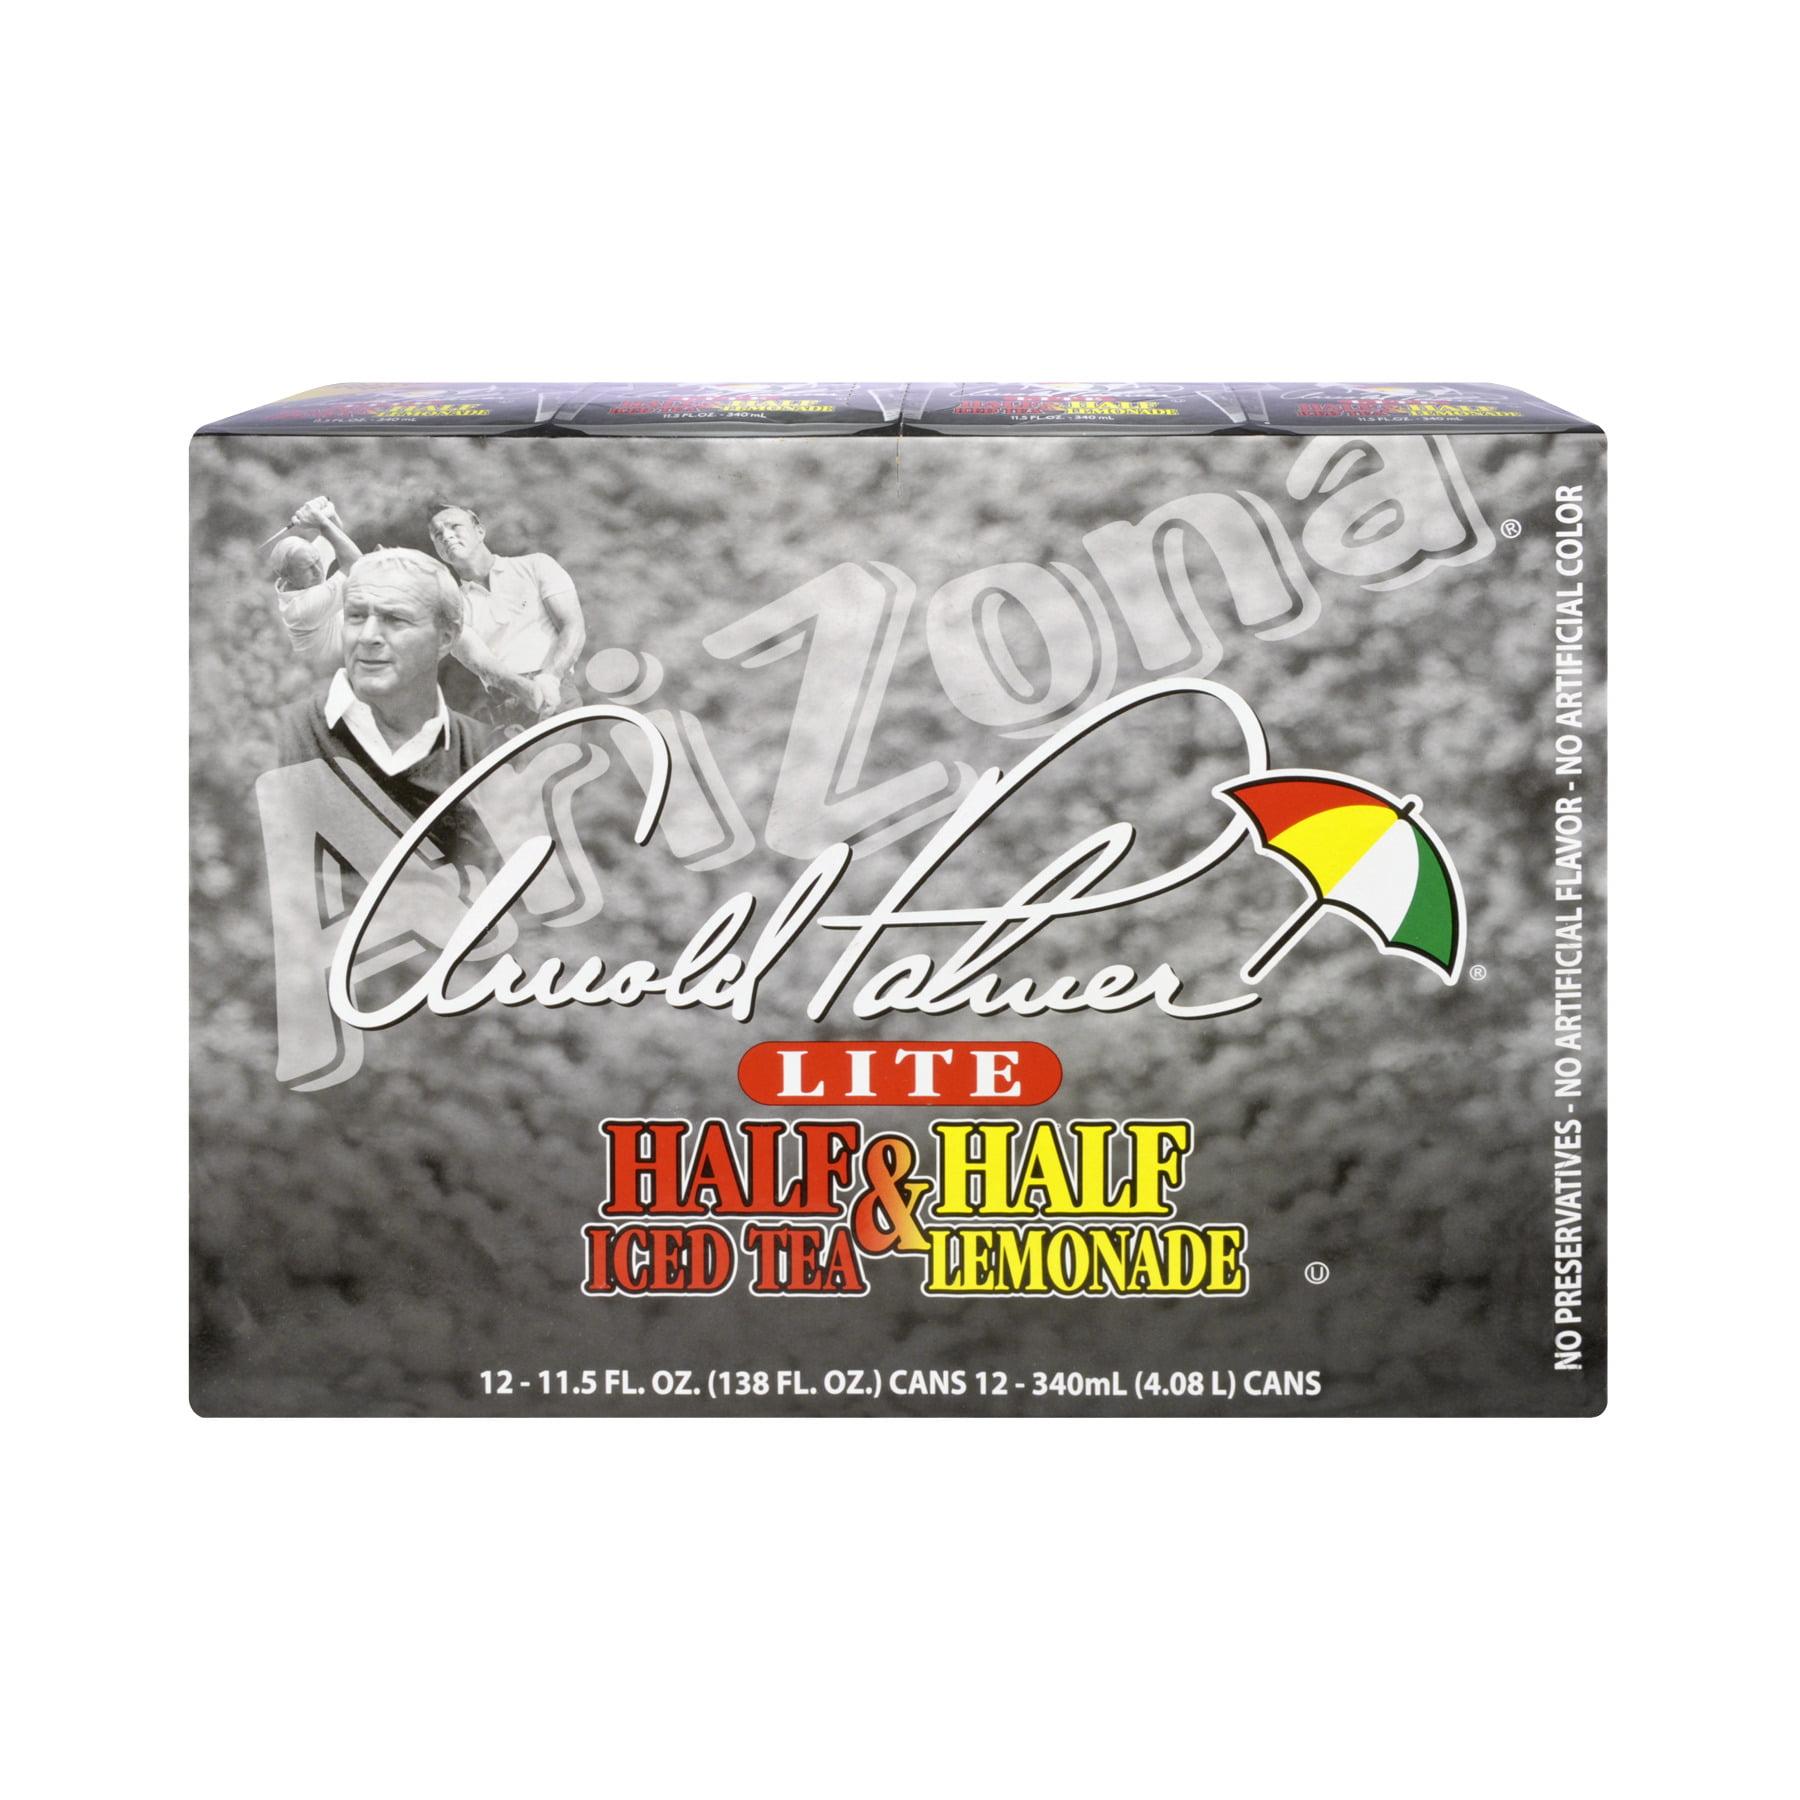 AriZona Arnold Palmer Half & Half Iced Tea Lemonade 12 PK, 138.0 FL OZ by AriZona Beverages USA